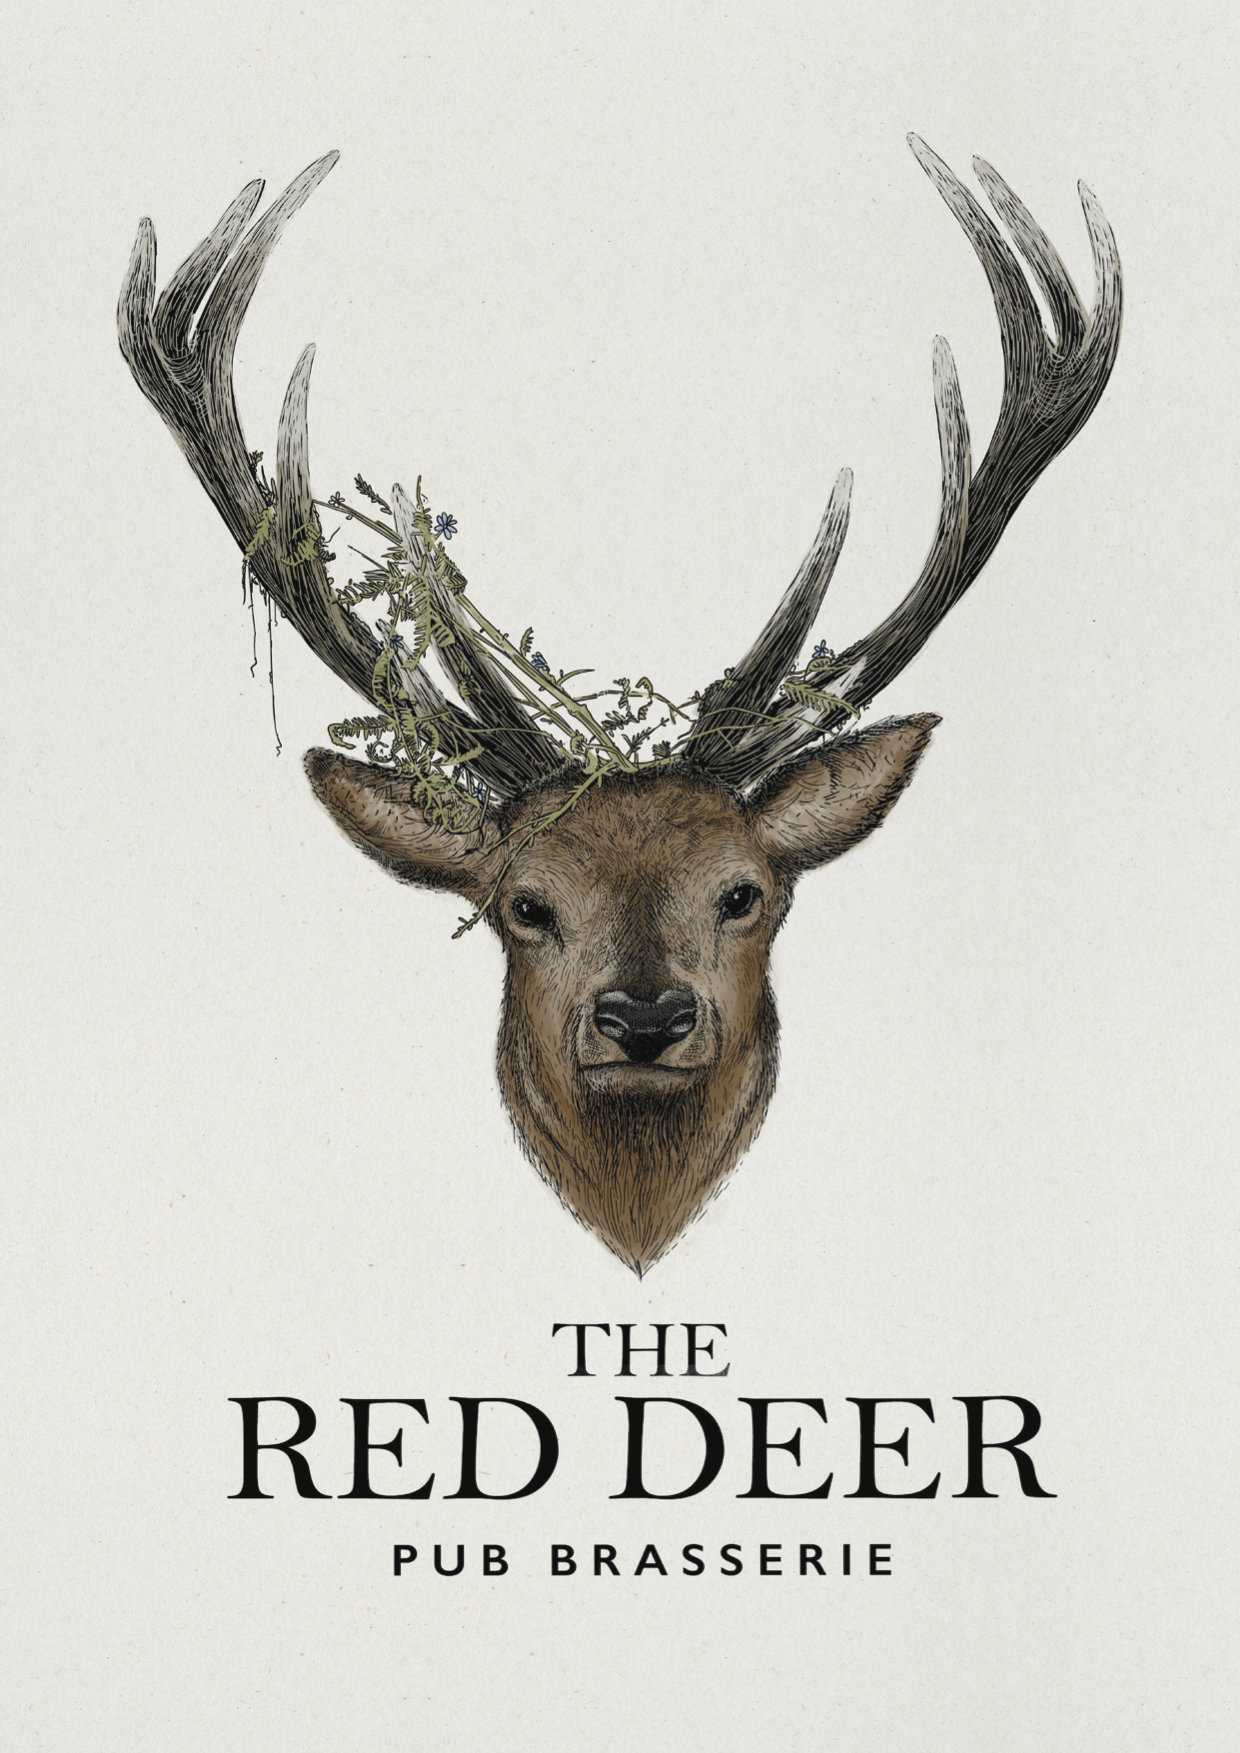 The Red Deer Logo